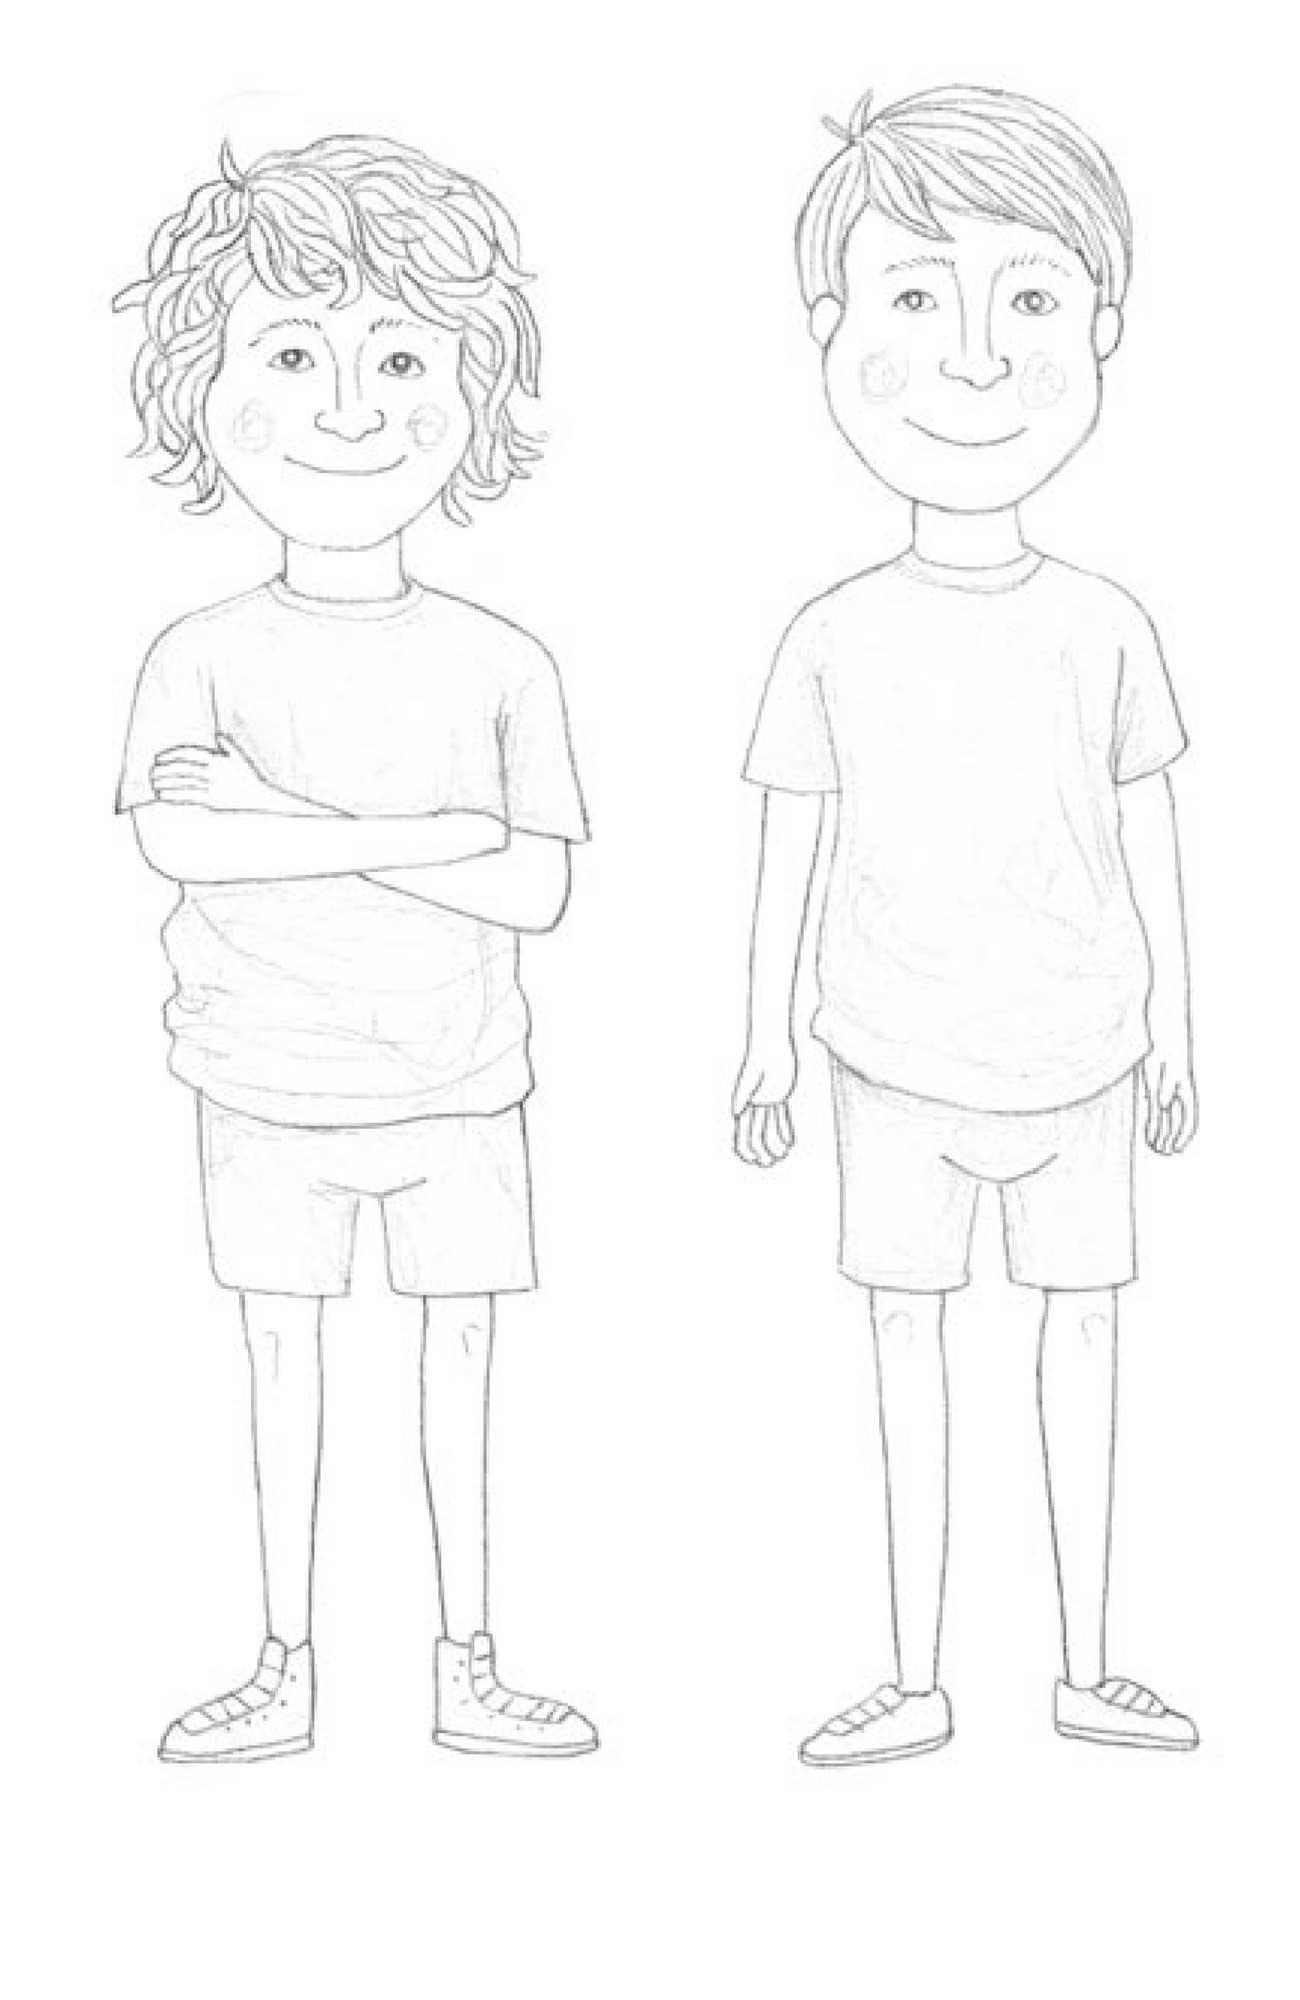 A Stinky Goblin middle grade fiction chapter 1 illustration